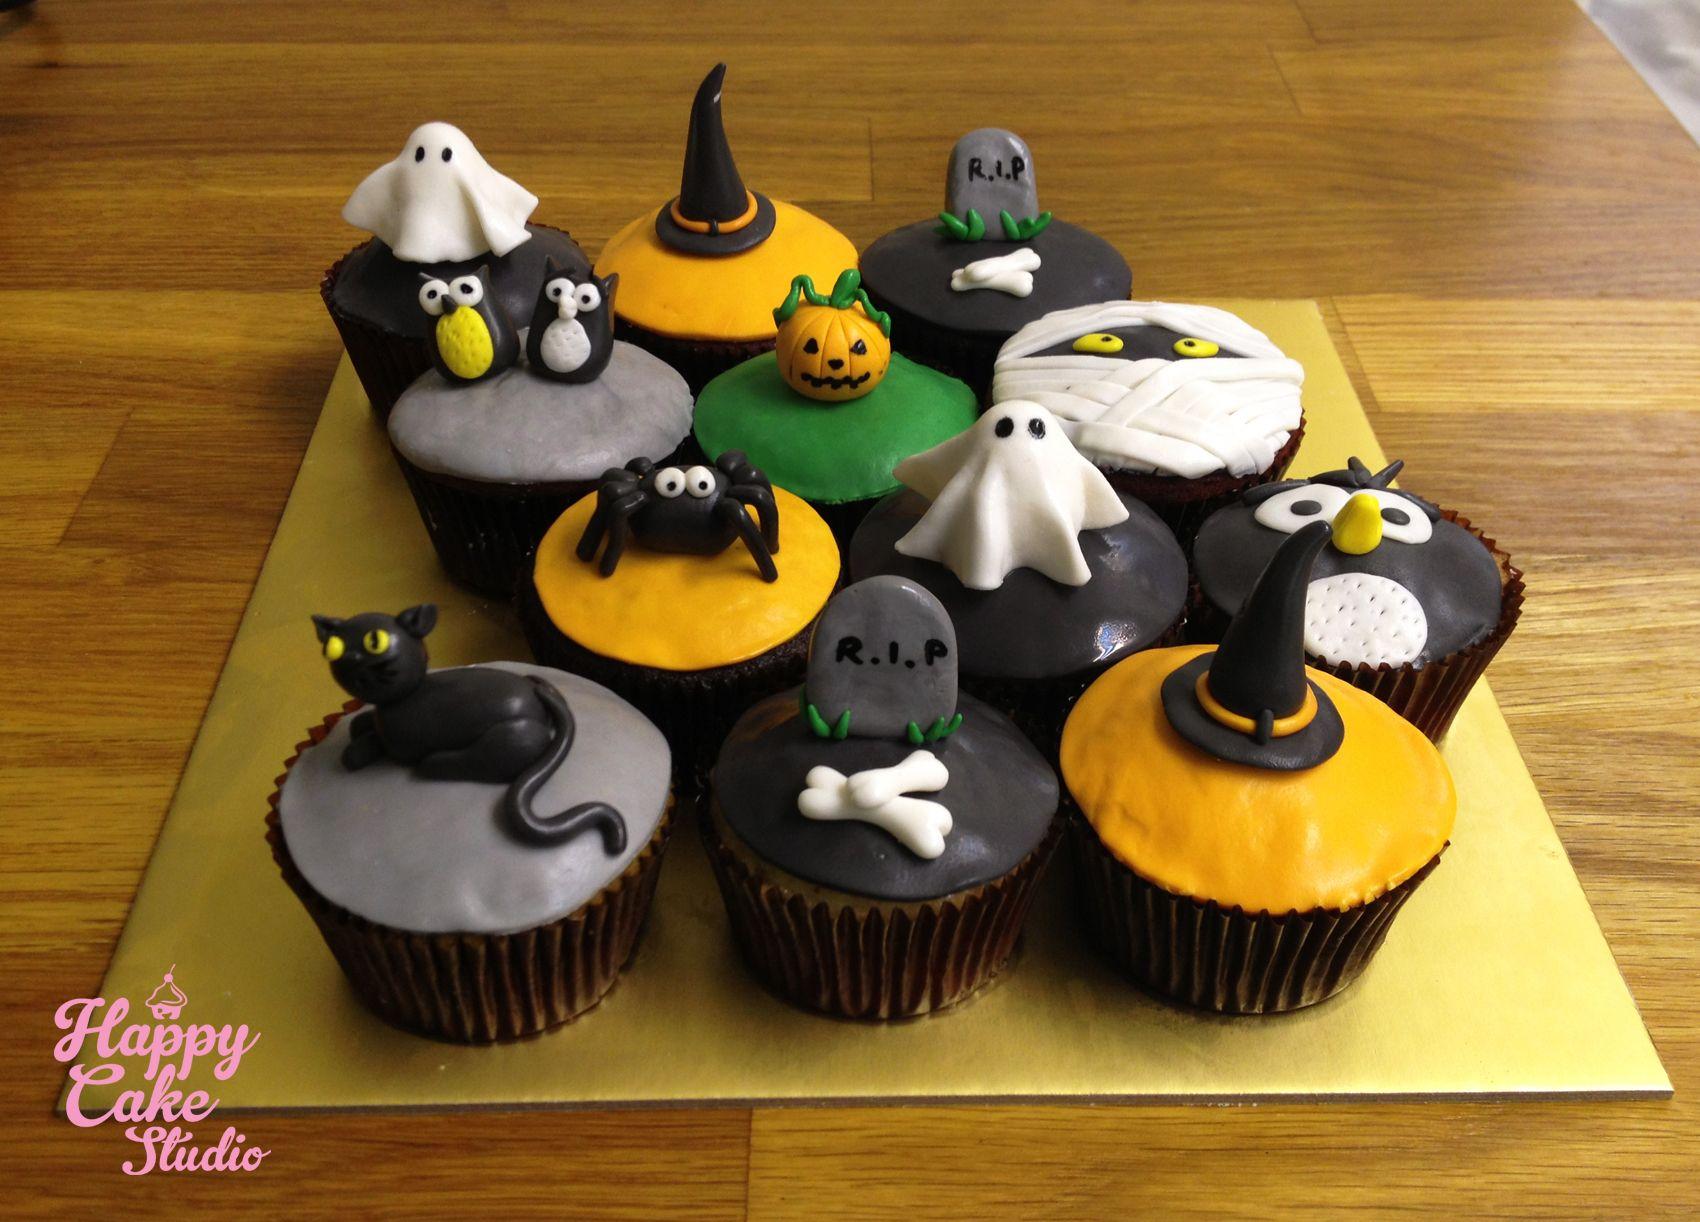 Fondant Halloween Decorations.Posts From October 2013 On Happy Cake Studio Halloween Cupcakes Halloween Cupcakes Decoration Halloween Food For Party